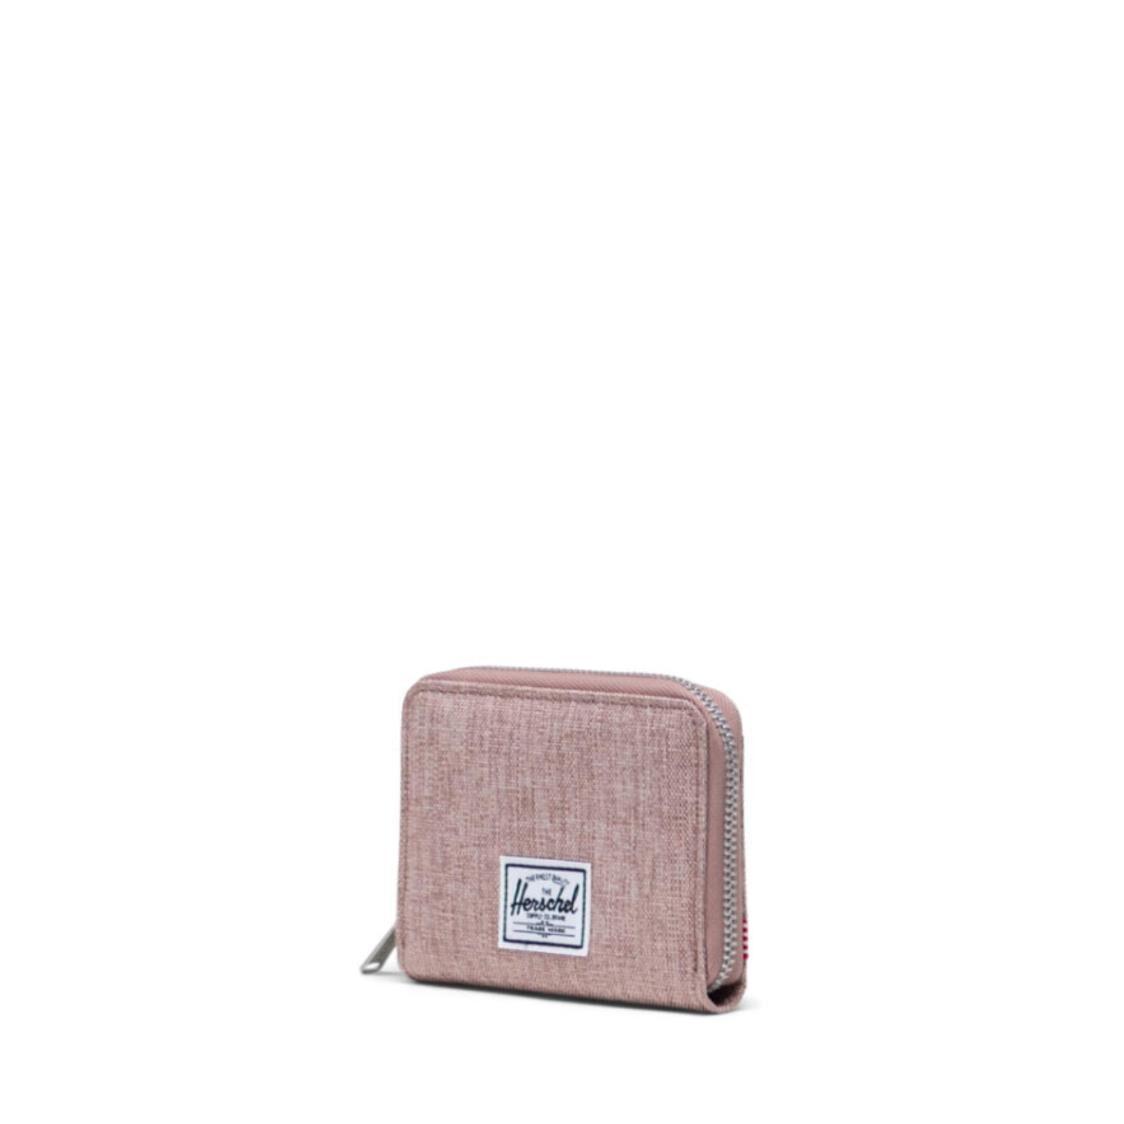 Herschel Tyler Ash Rose Crosshatch Wallet 10691-04885-OS